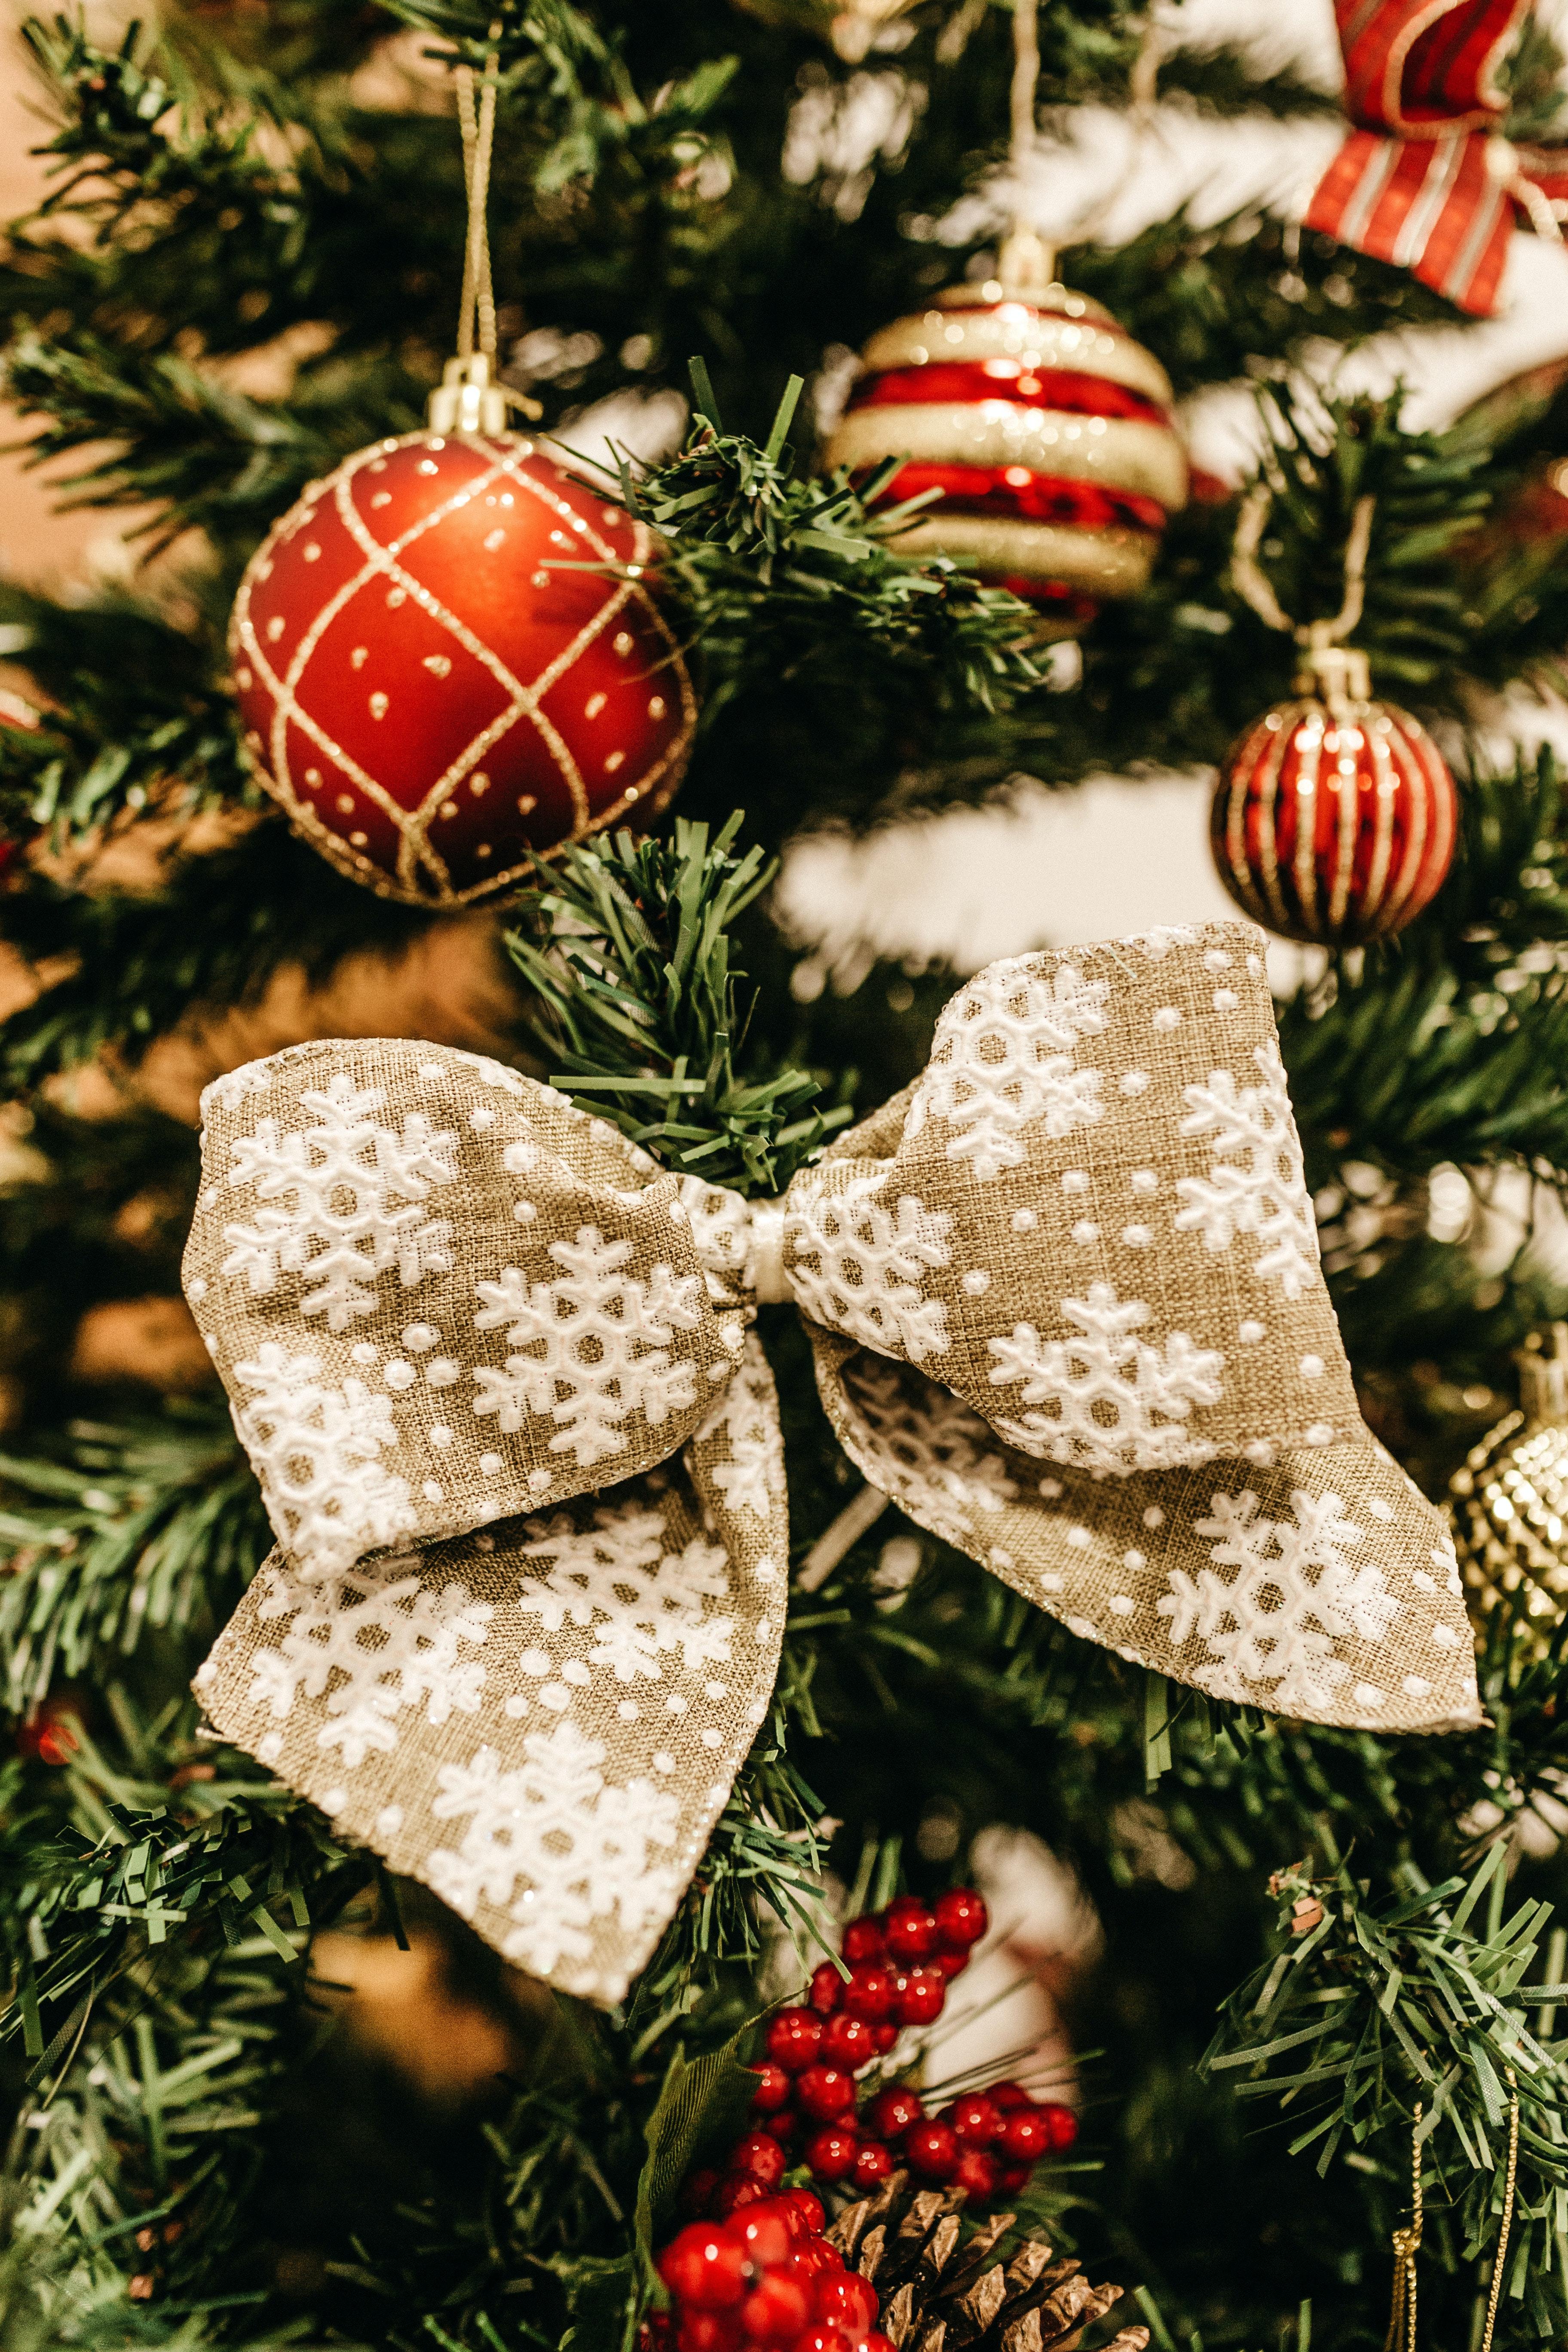 Christmas Tree Decor · Free Stock Photo